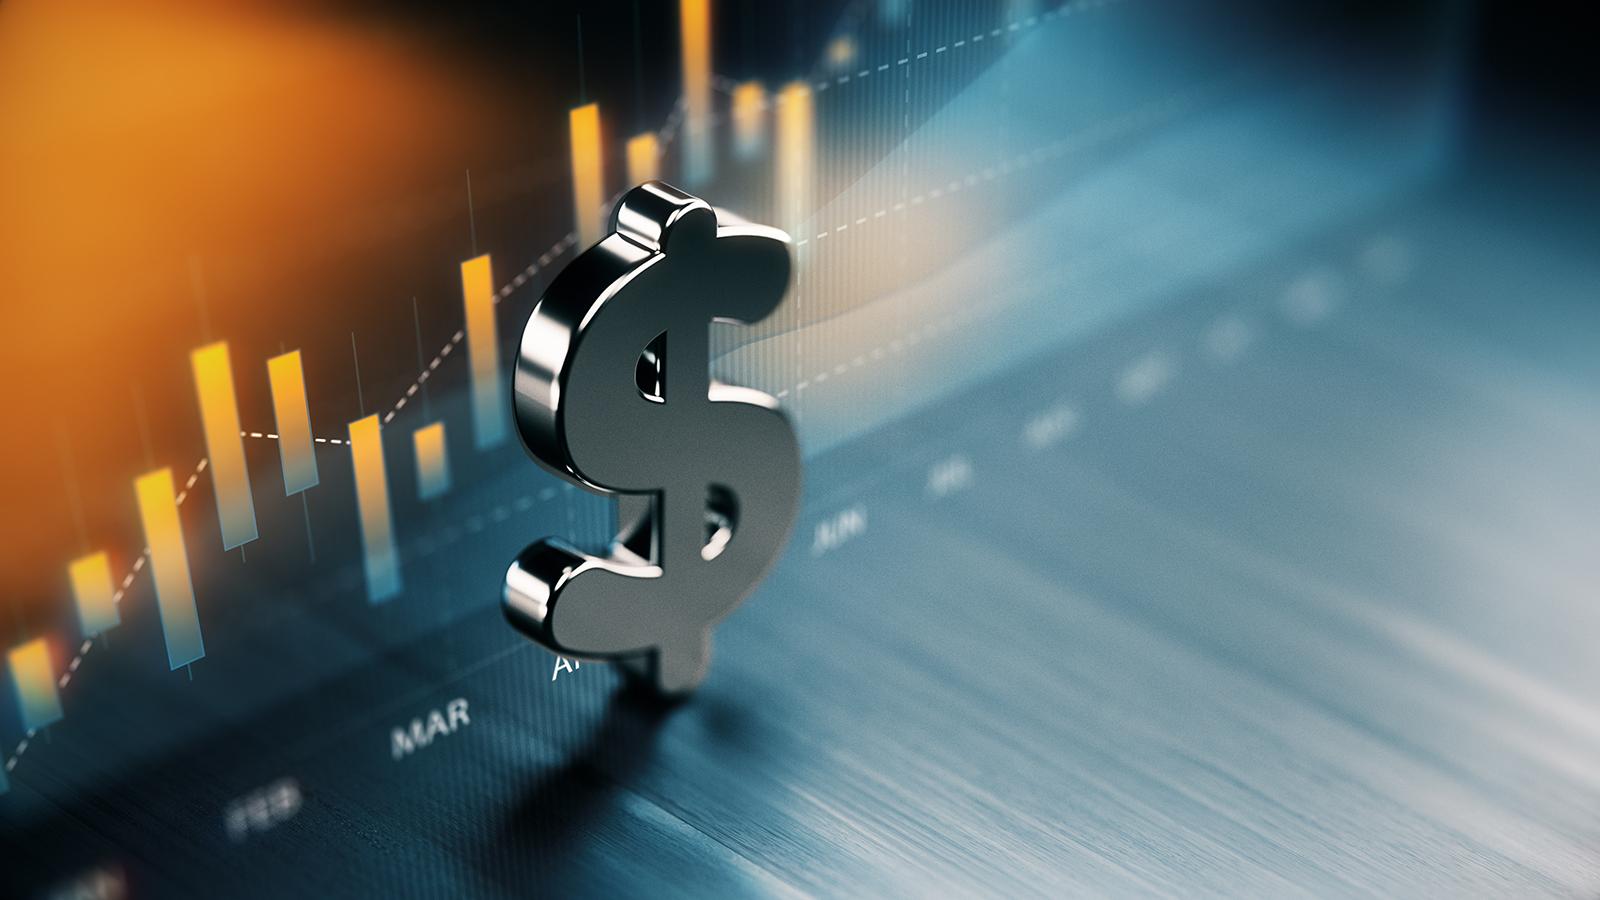 Savings - <b>NAHB</b>